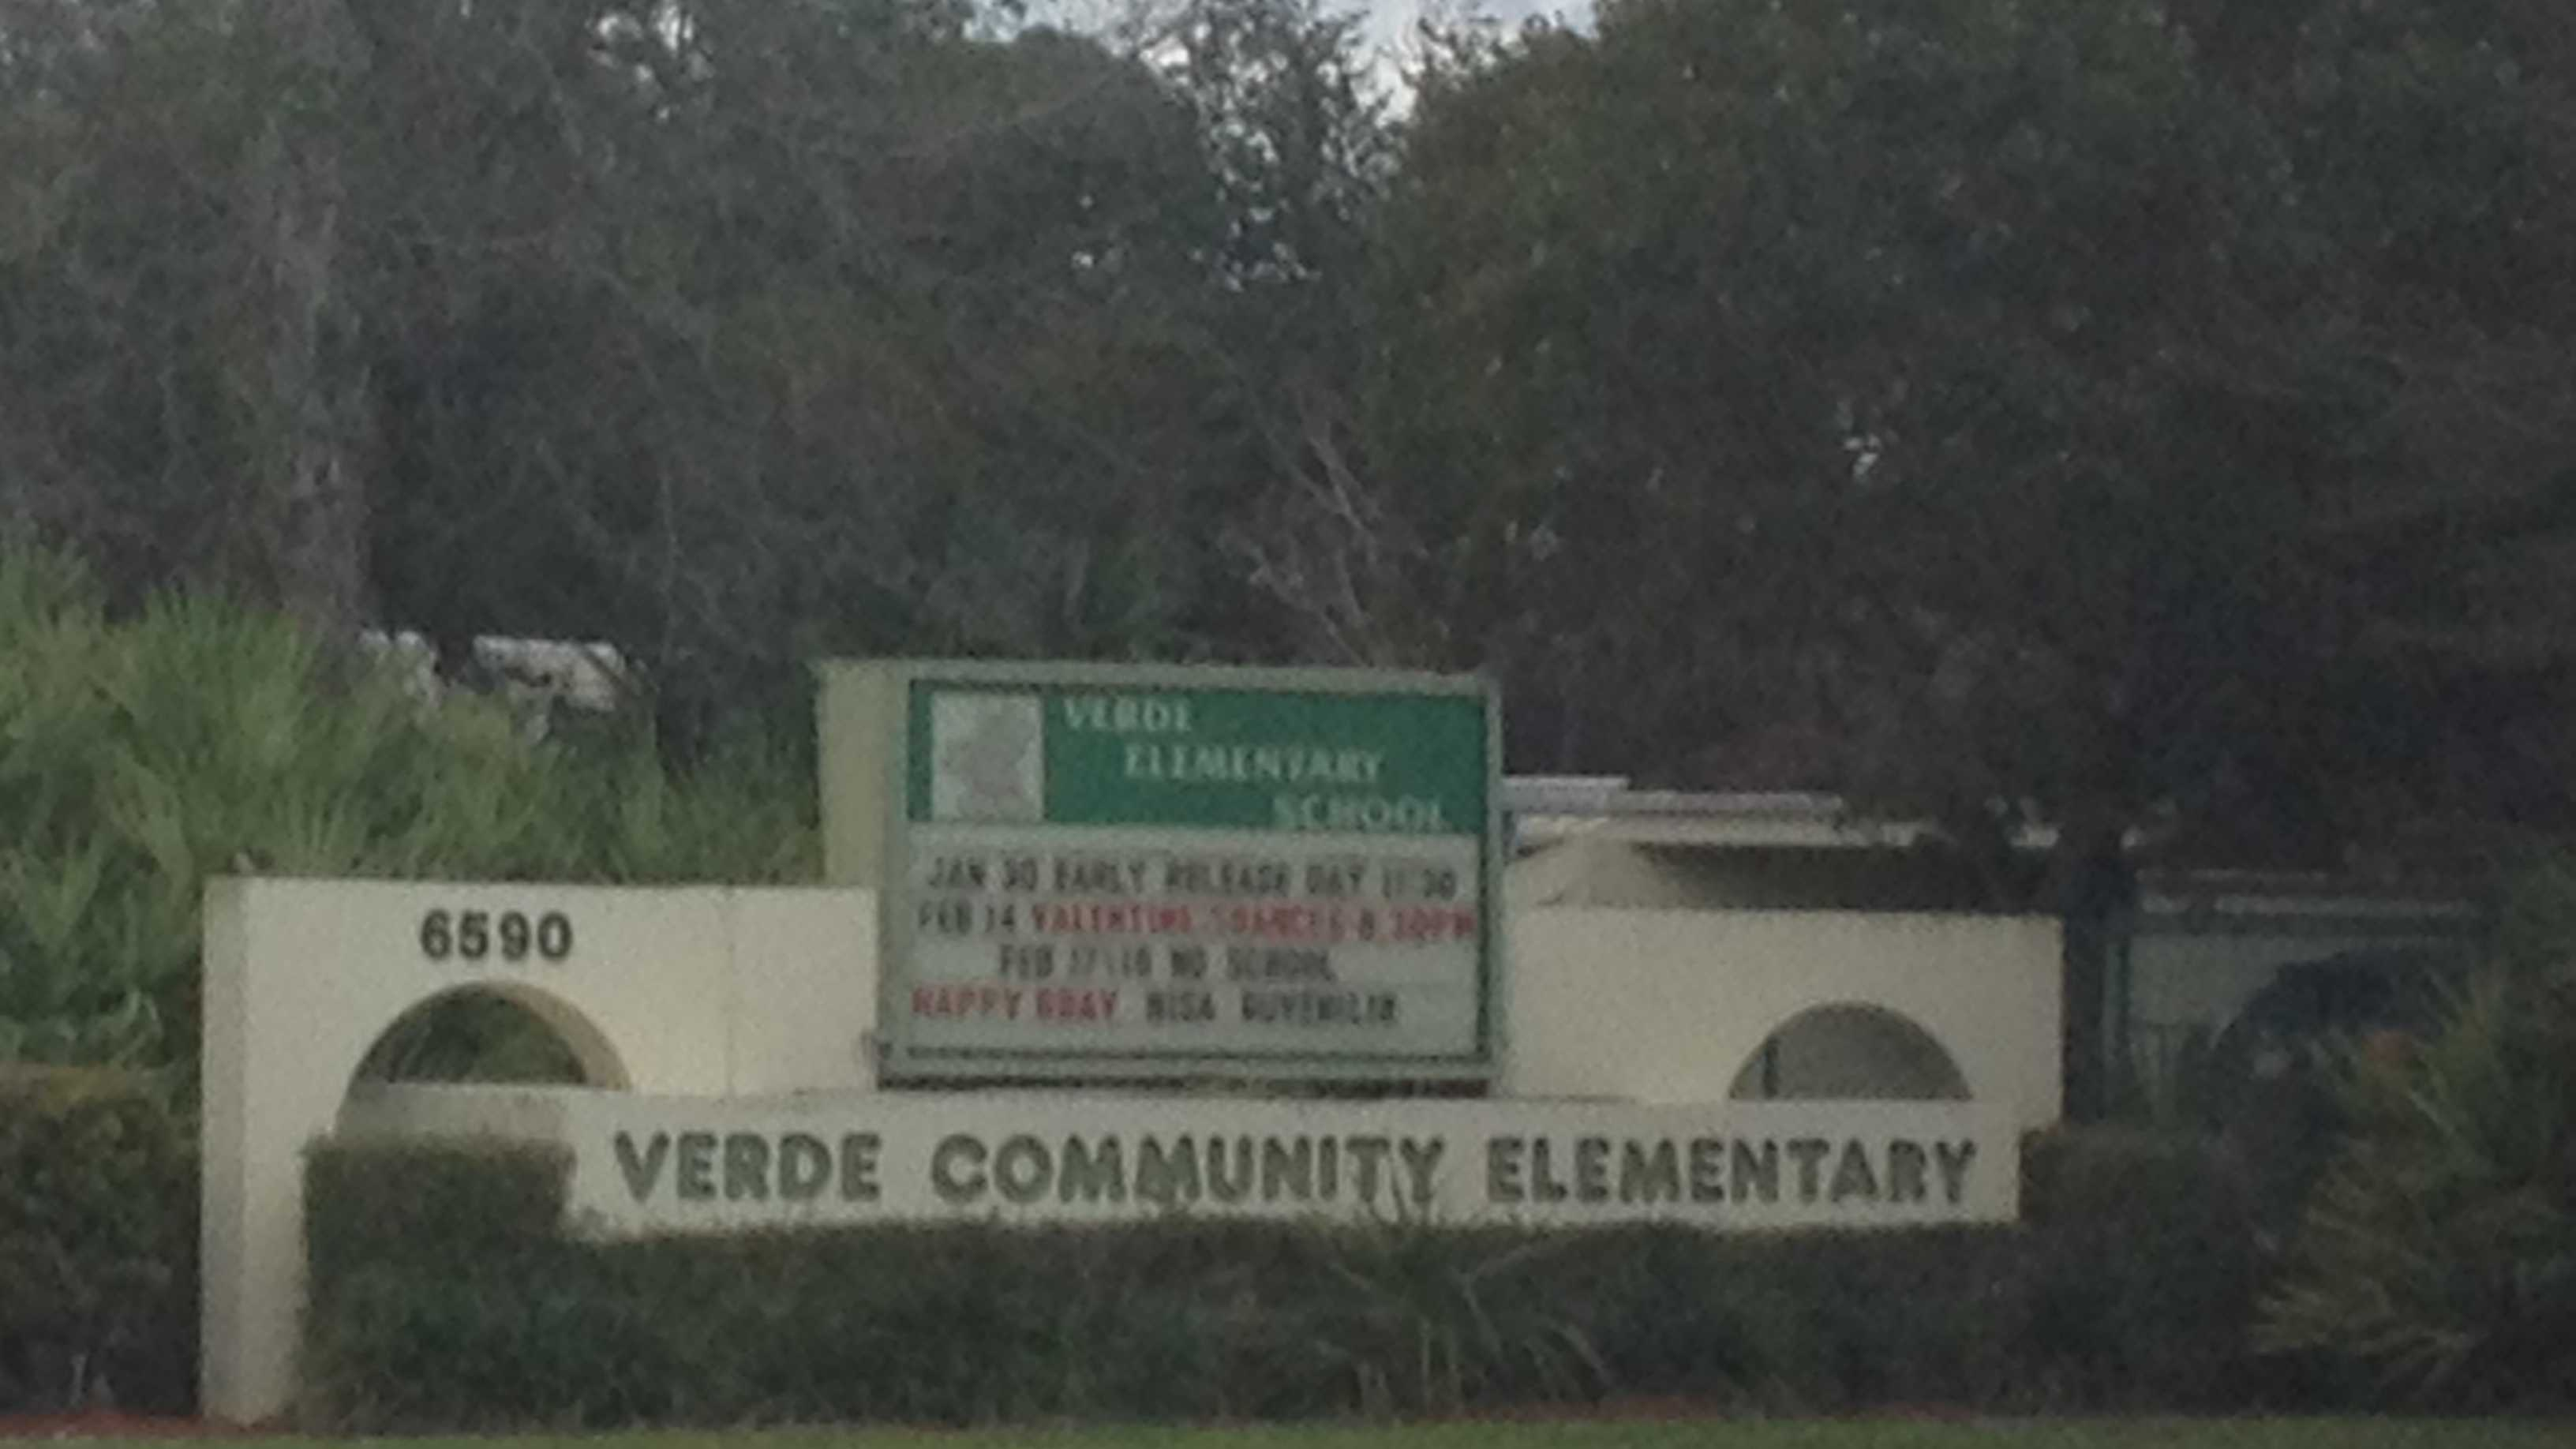 Verde Elementary School